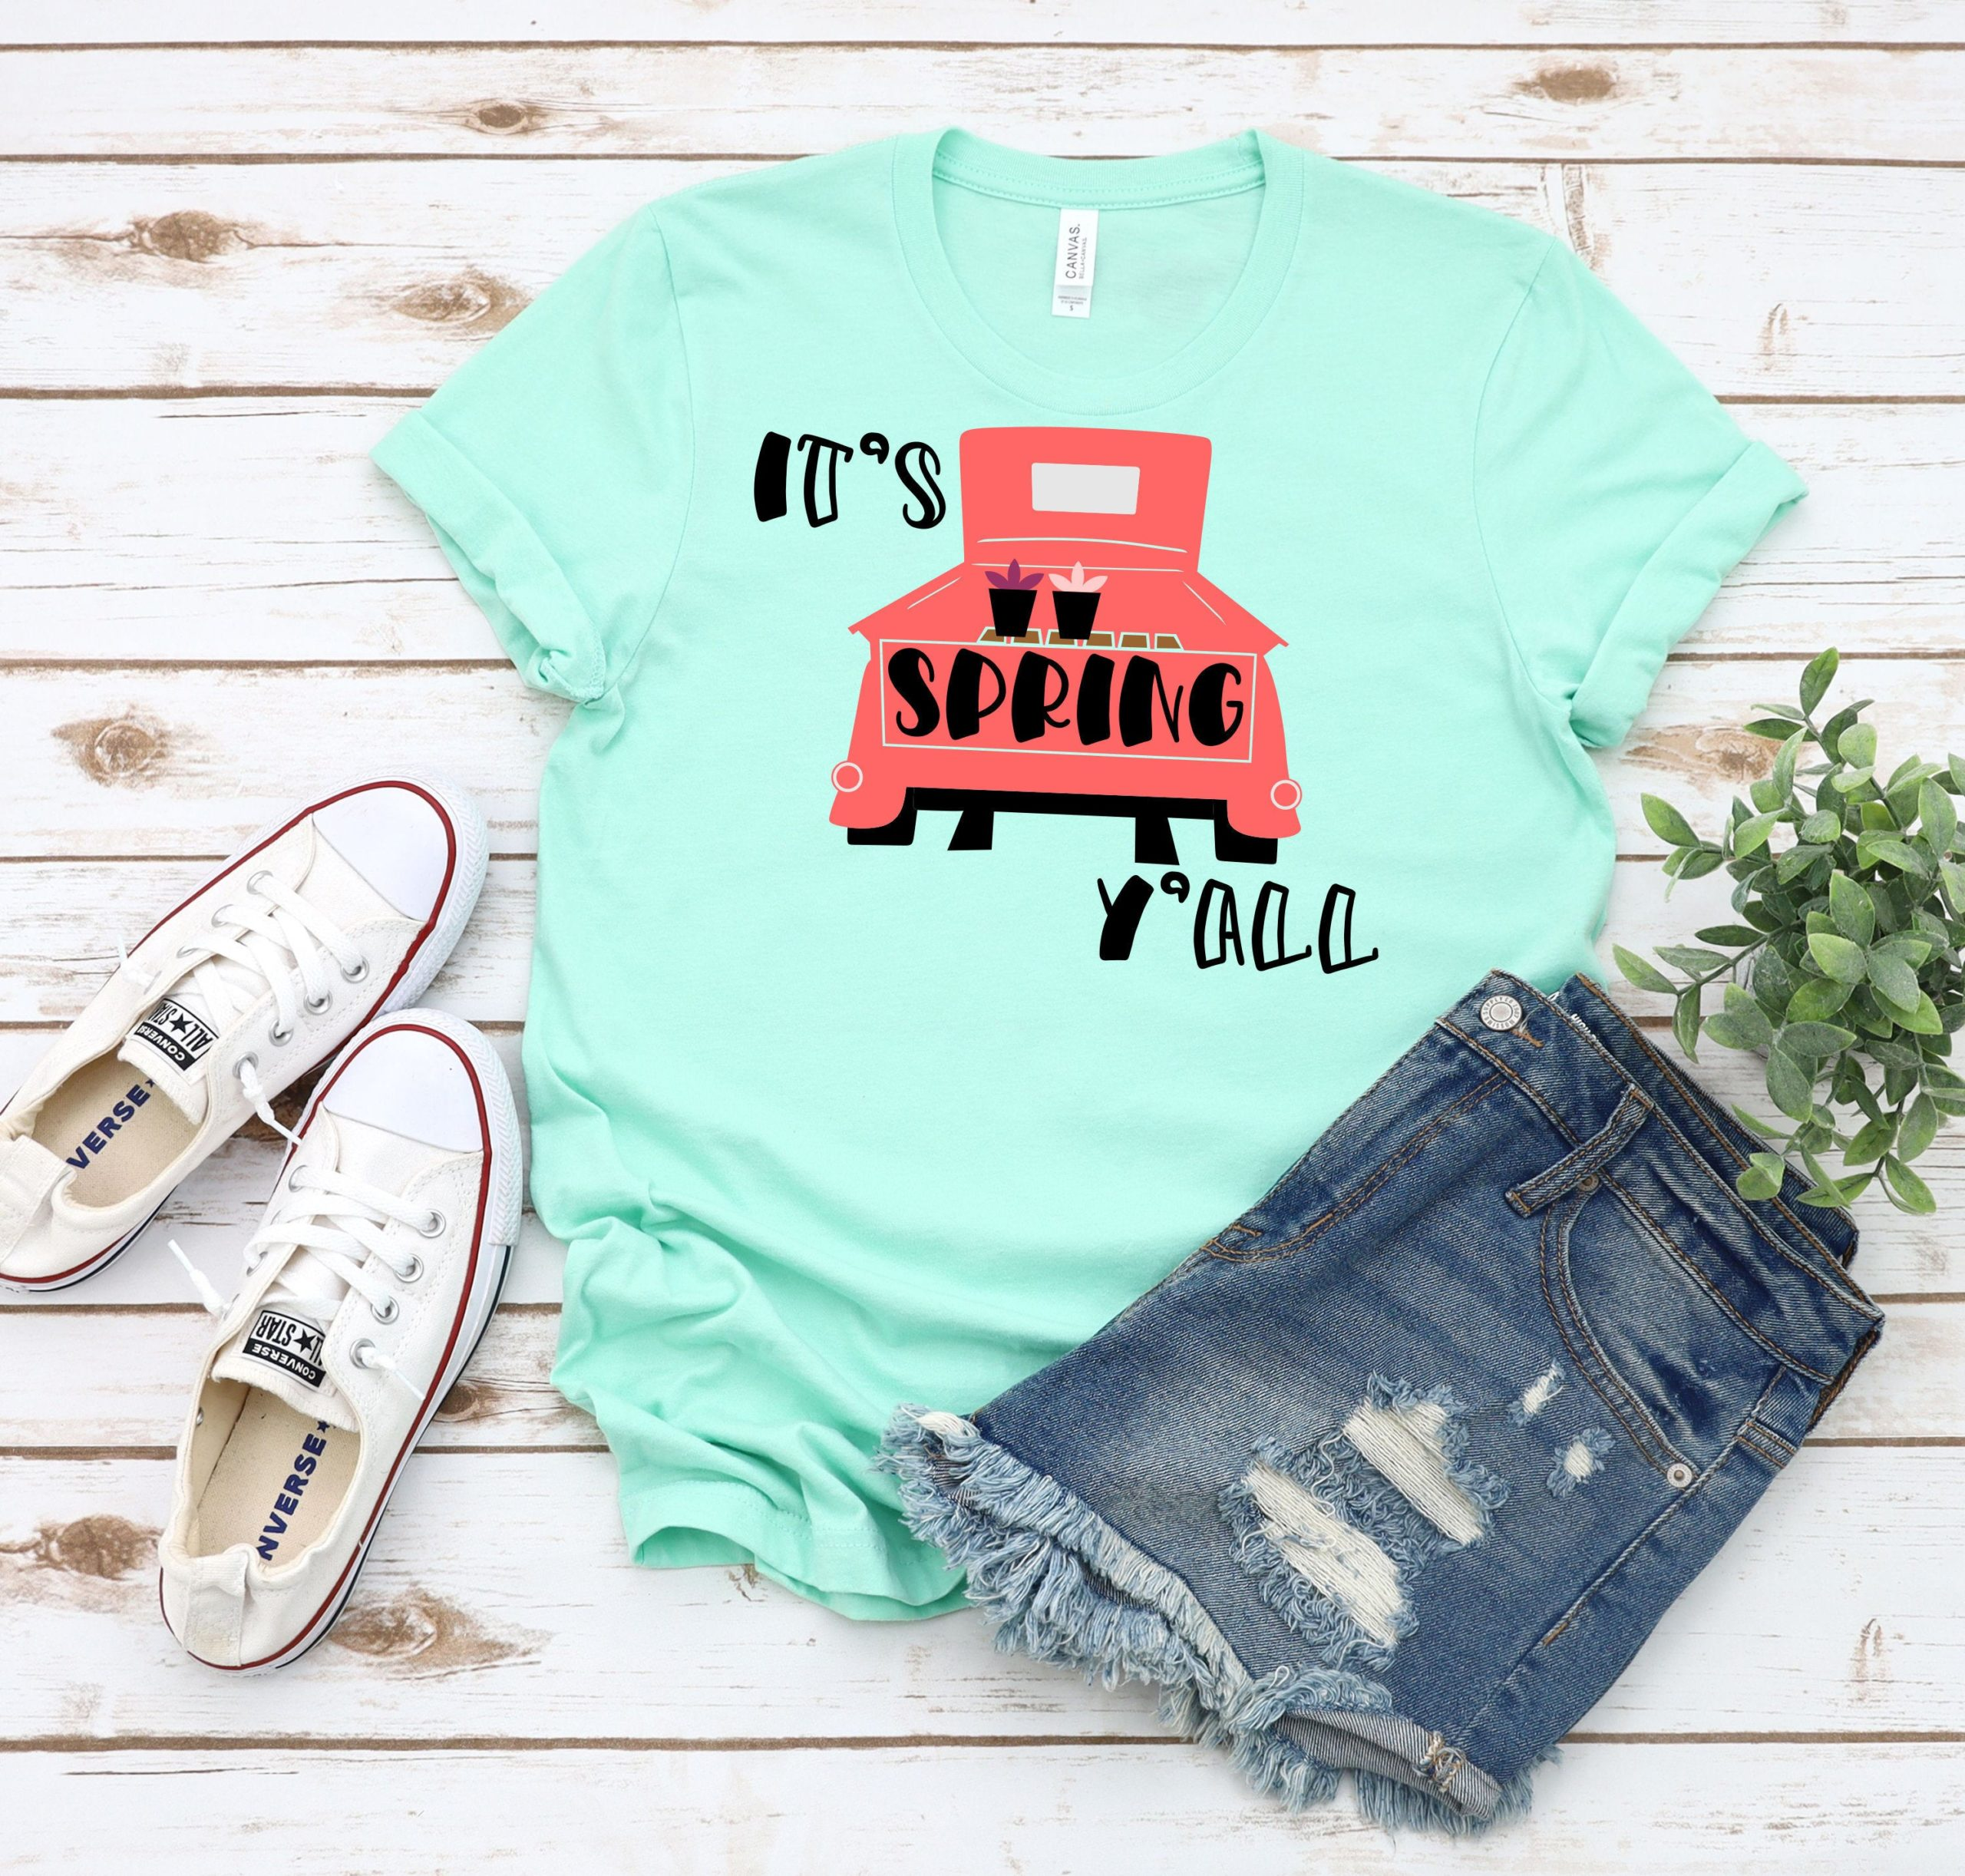 Spring-svg-its-spring-yall-svg-easter-svg-vintage-truck-svg-easter-truck-svg-spring-svg-design-spring-cut-file-spring-cricut-svg-60513b72